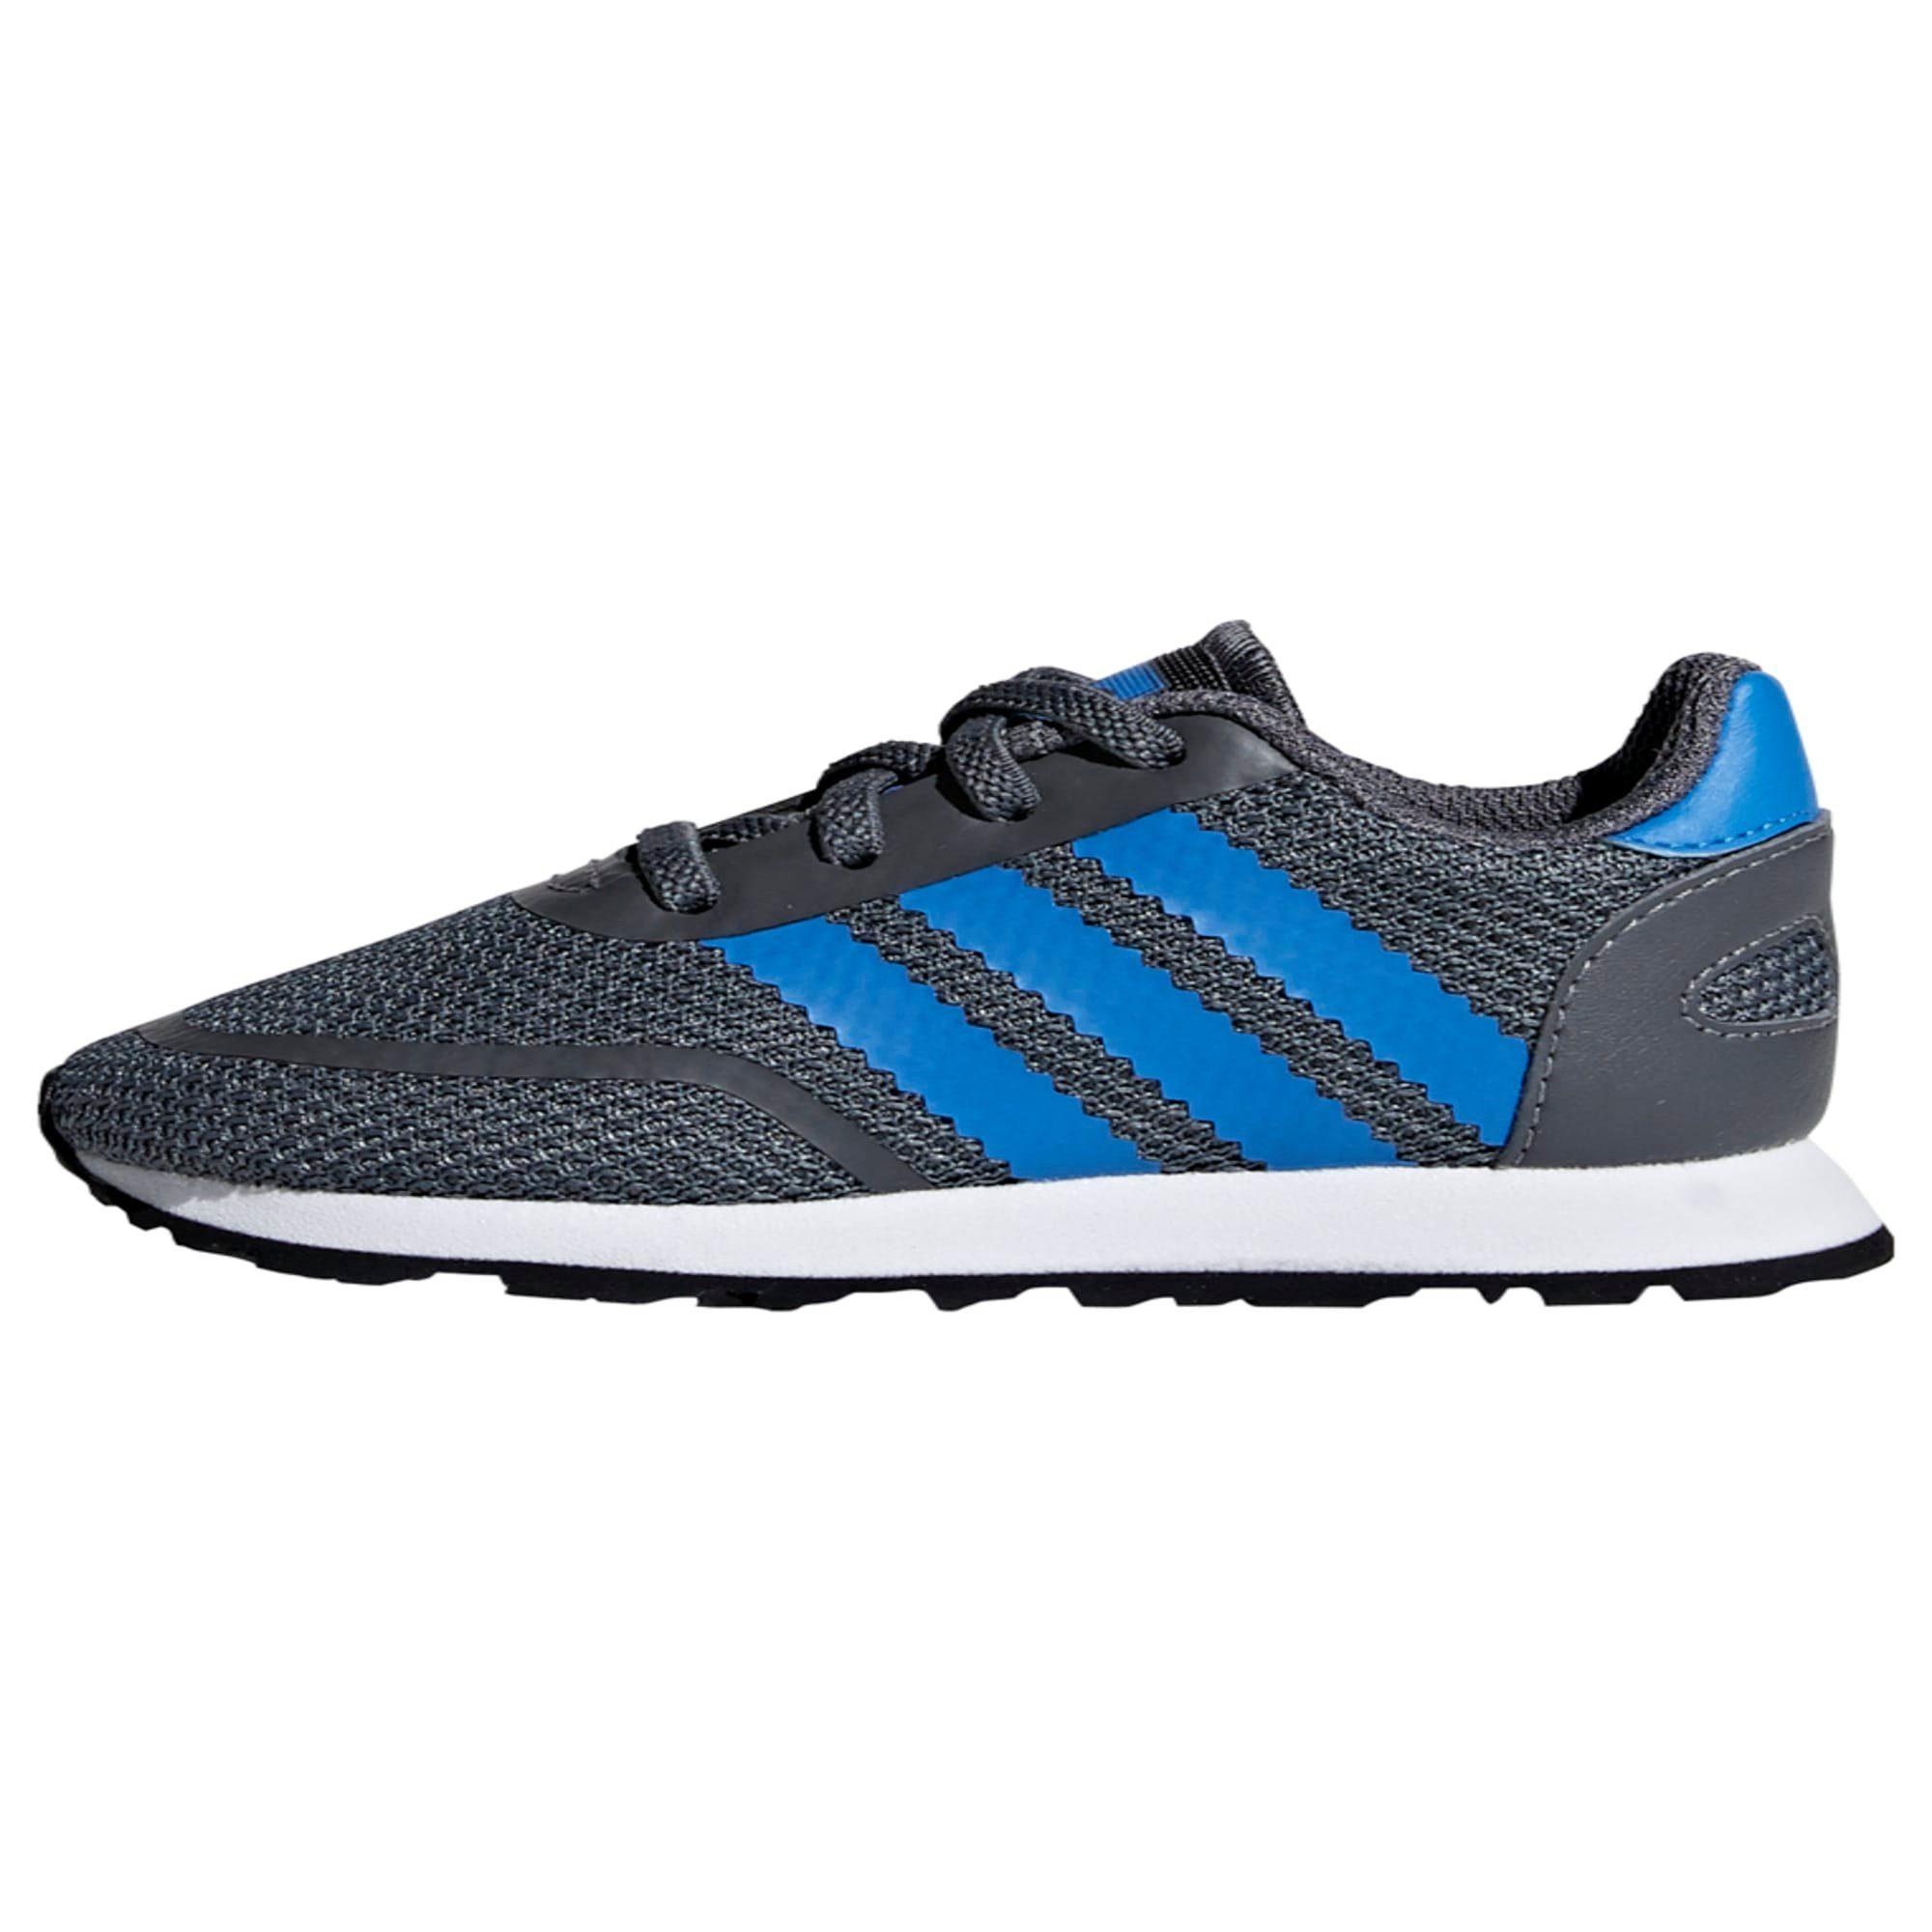 5923OTTO Schuh« »N N adidas 5923 Originals Sneaker 4Aj5RL